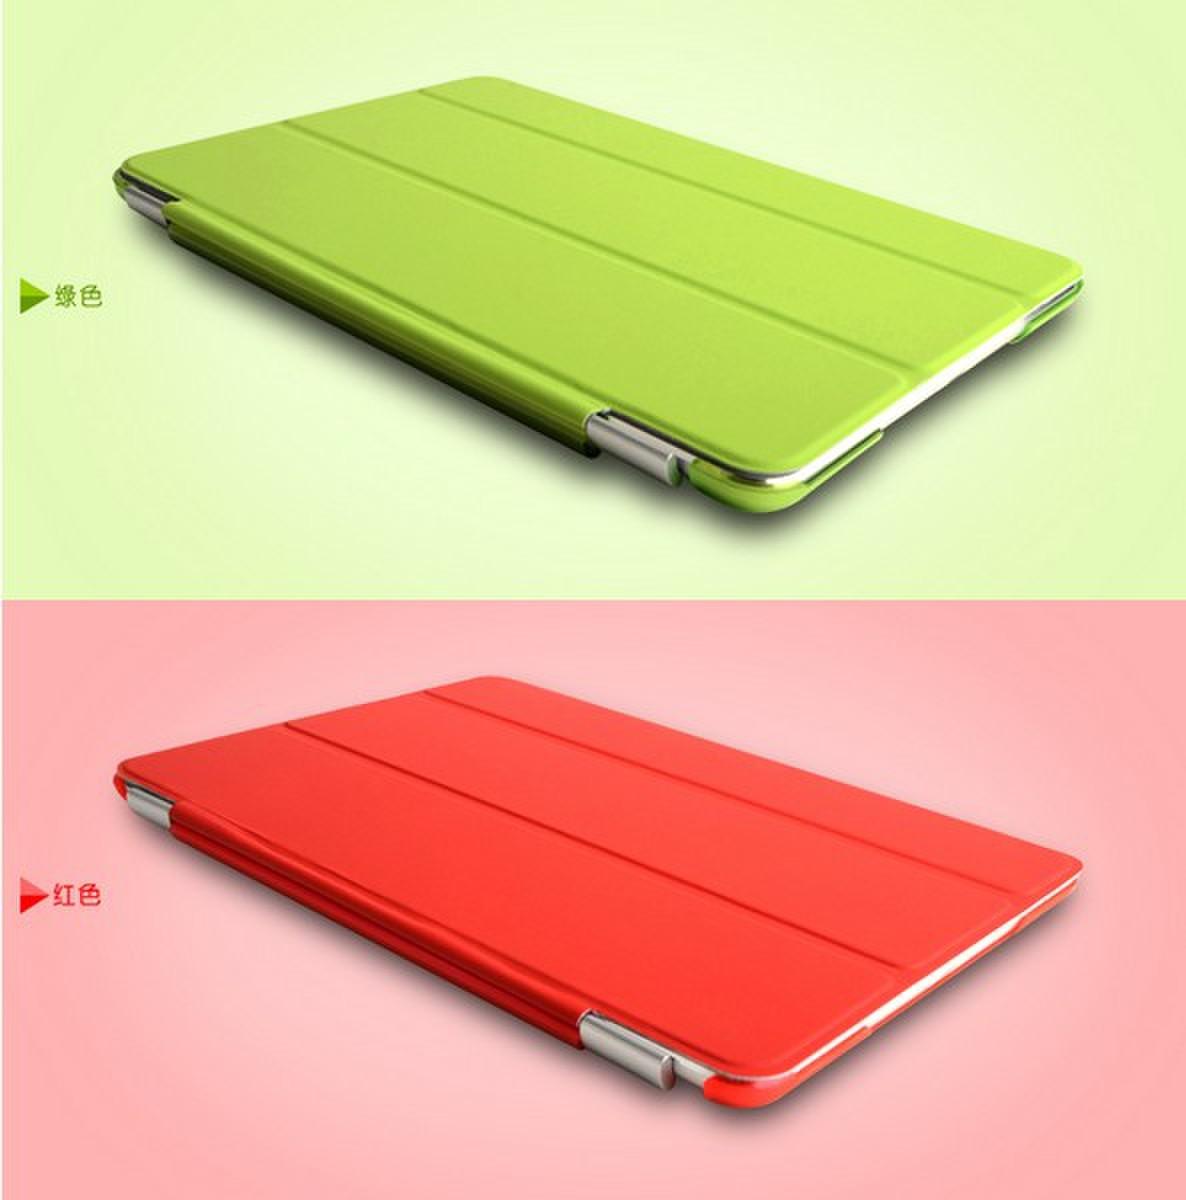 for ipad mini 2 light color leather cover